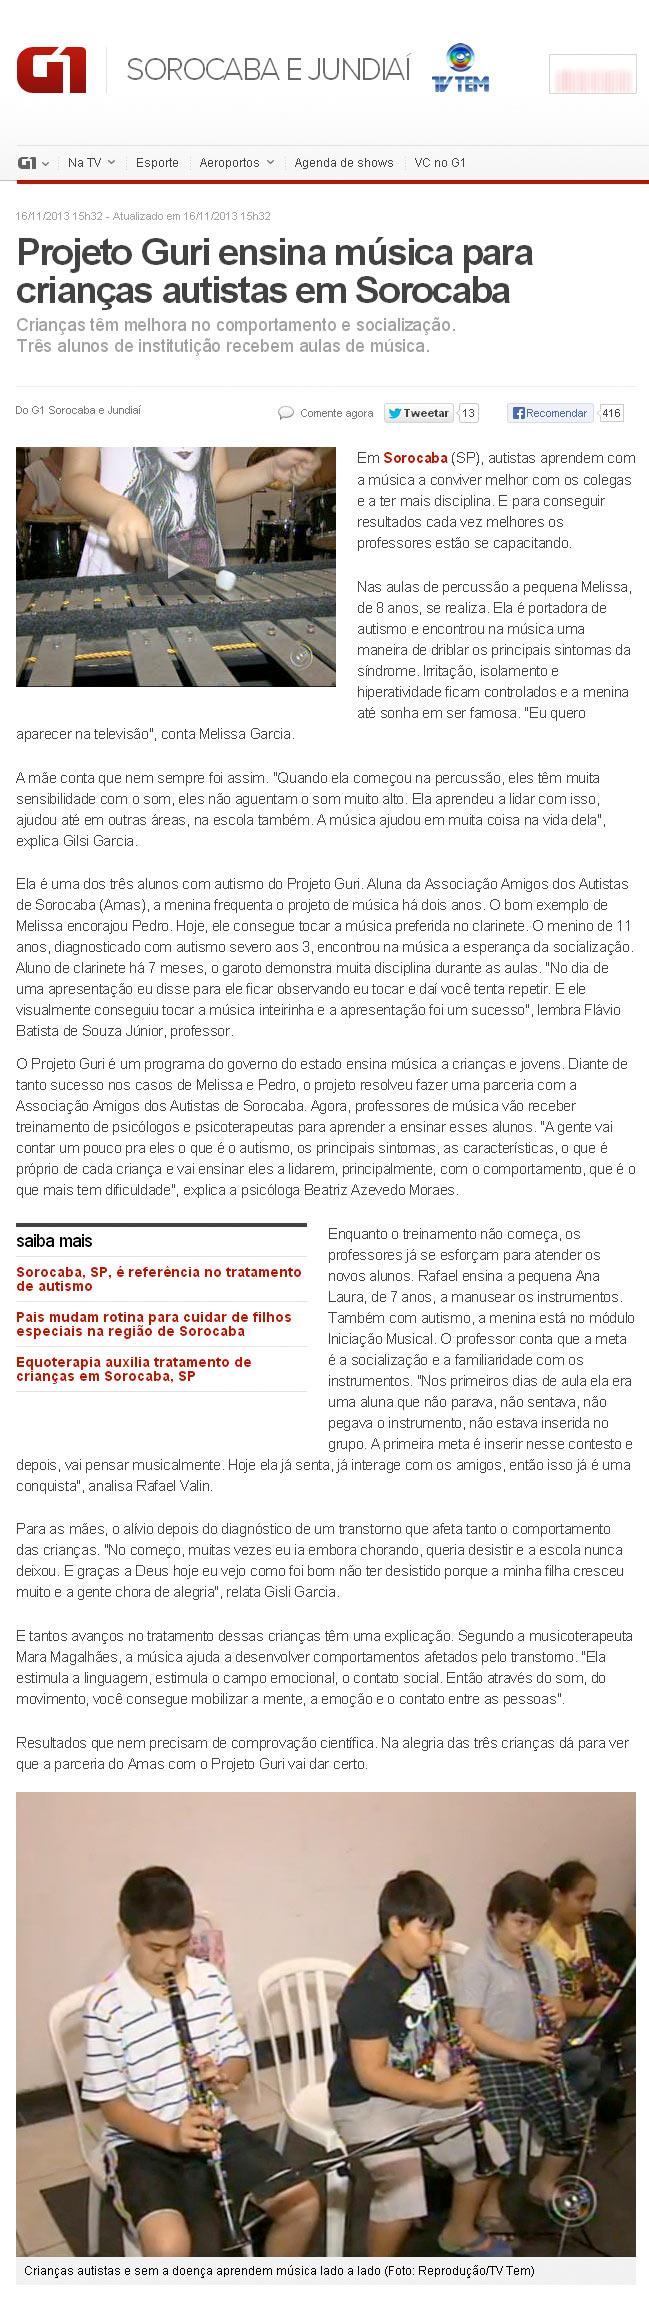 sorocaba_g1